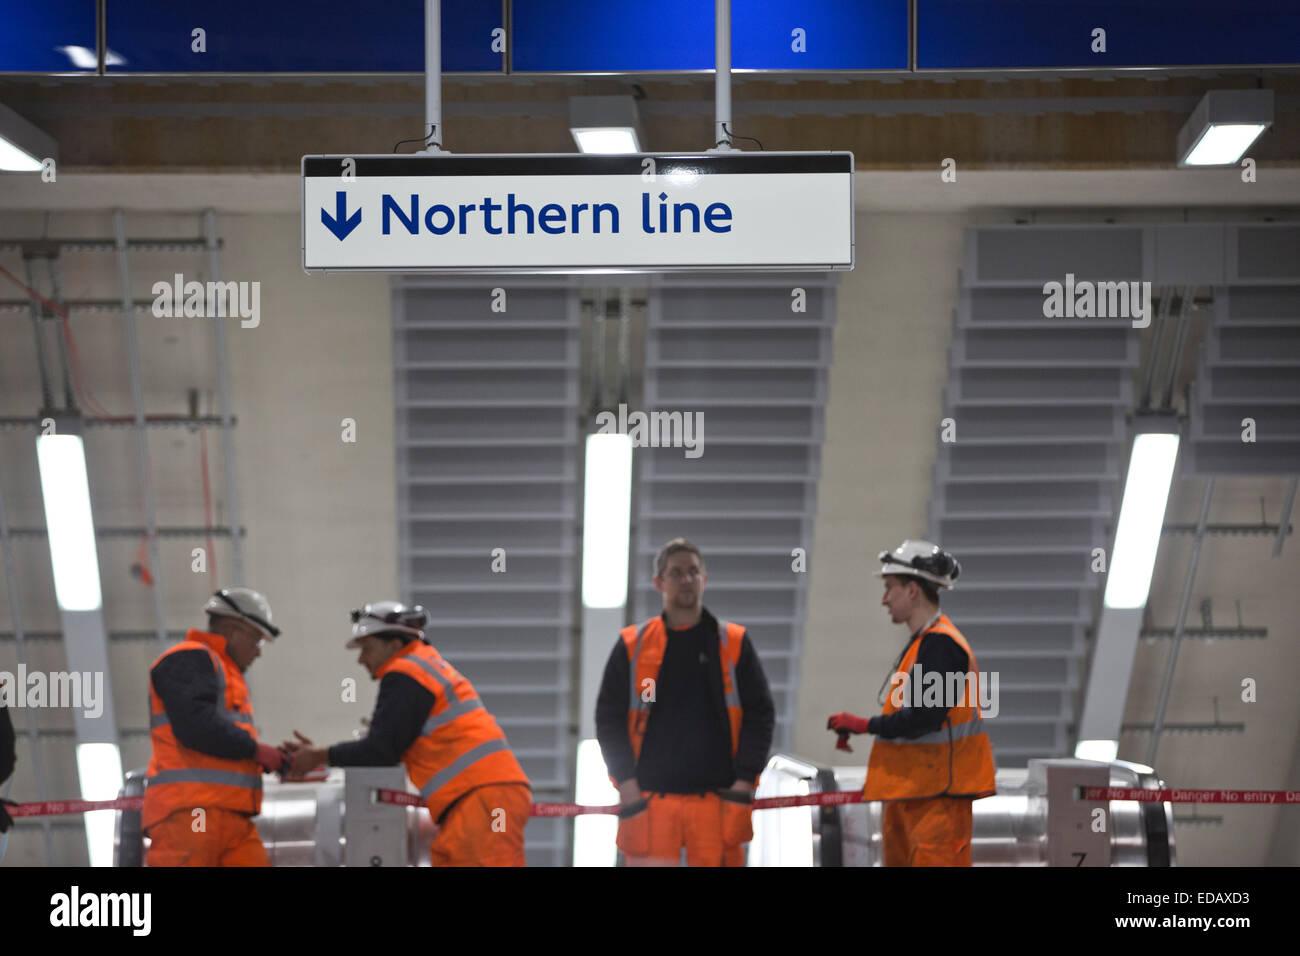 Tottenham Court Road Tube Station, redevelopment on the Northern Line segment of the London Underground, London, - Stock Image